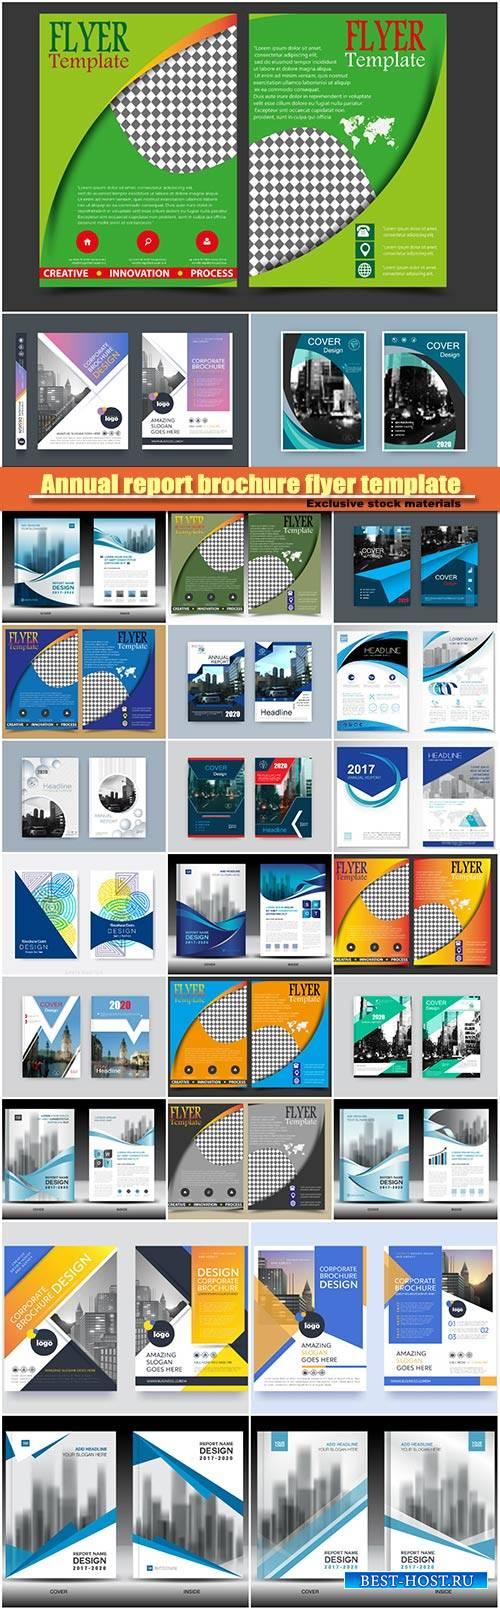 Annual report brochure flyer template, cover design, business company profi ...